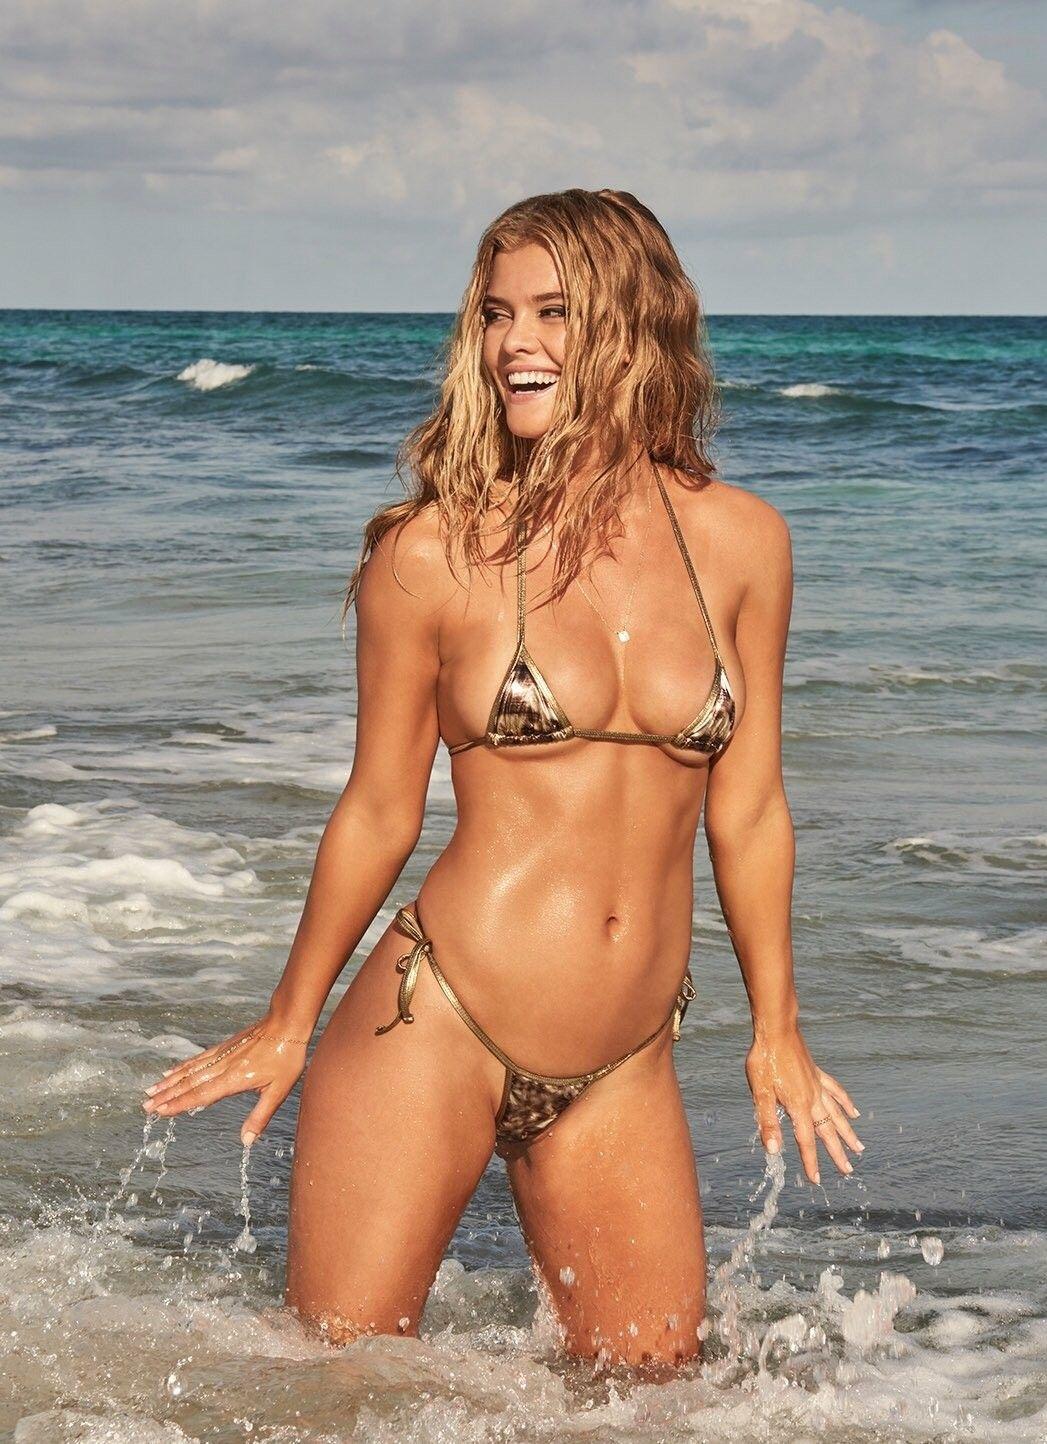 Stunning! Nina Agdal hits 2017 Sports Illustrated Swimsuit